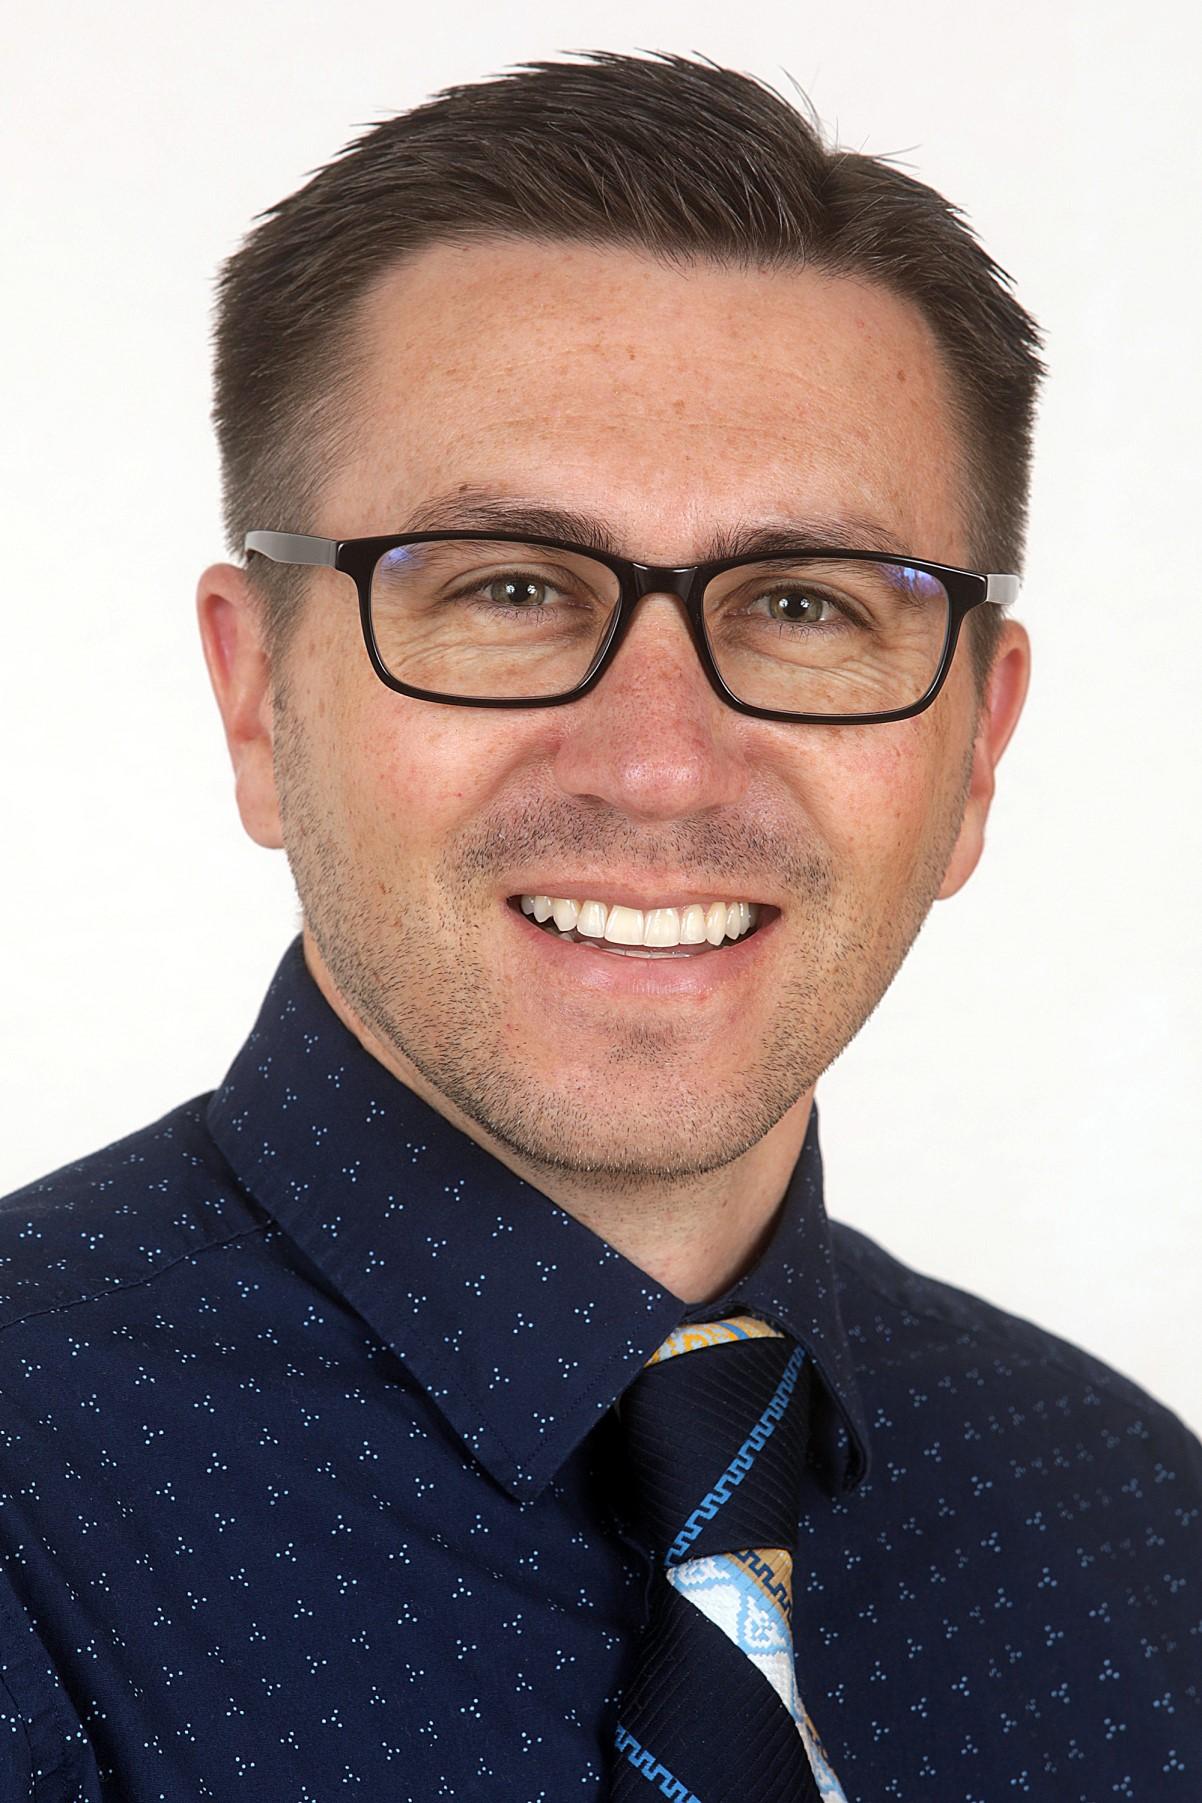 Jason Patrick, FNP-C